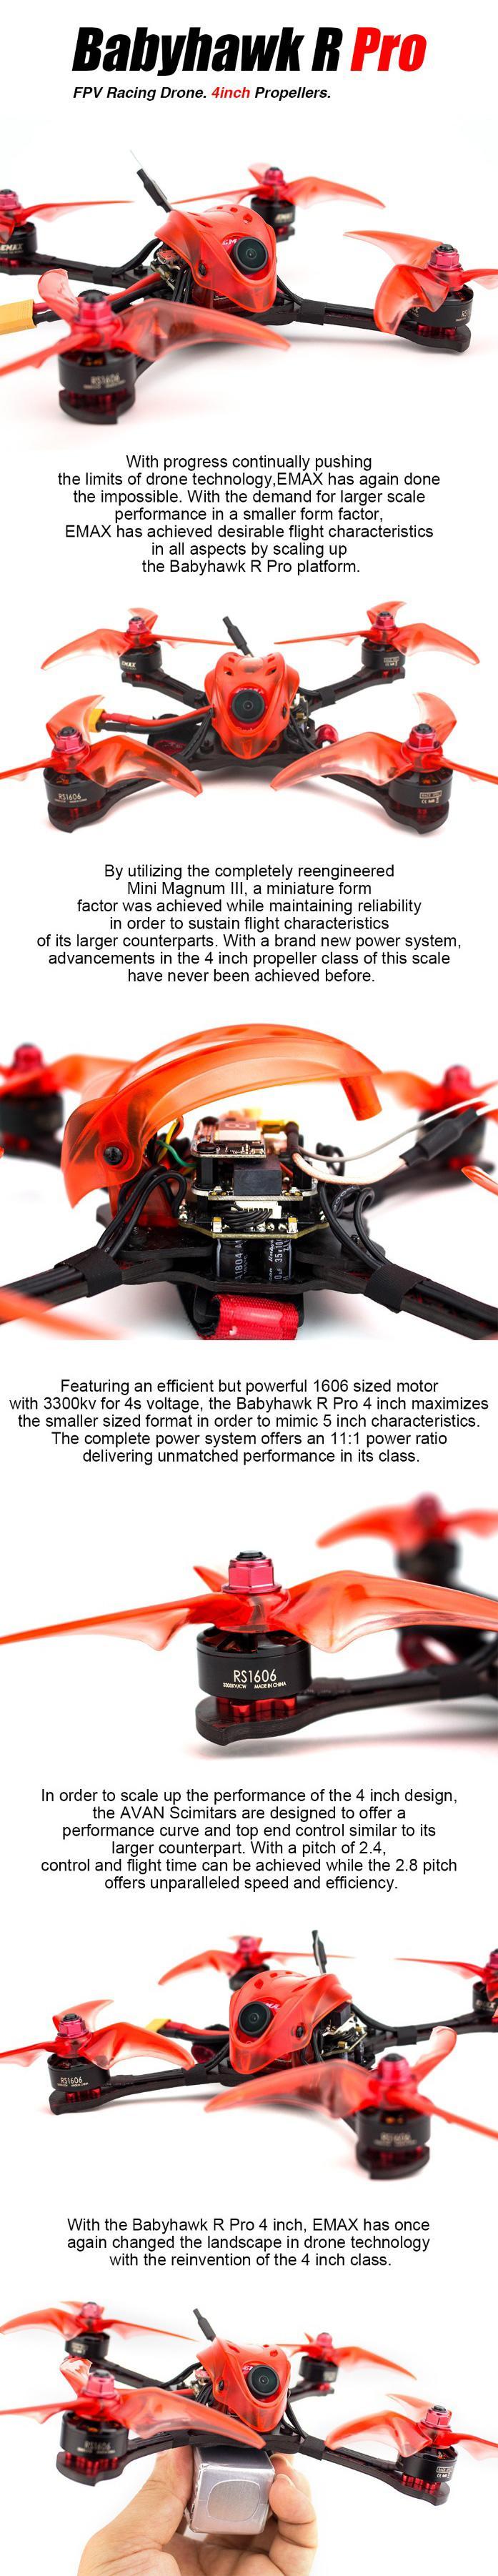 Emax Babyhawk R Pro 4 inch racing drone bnf